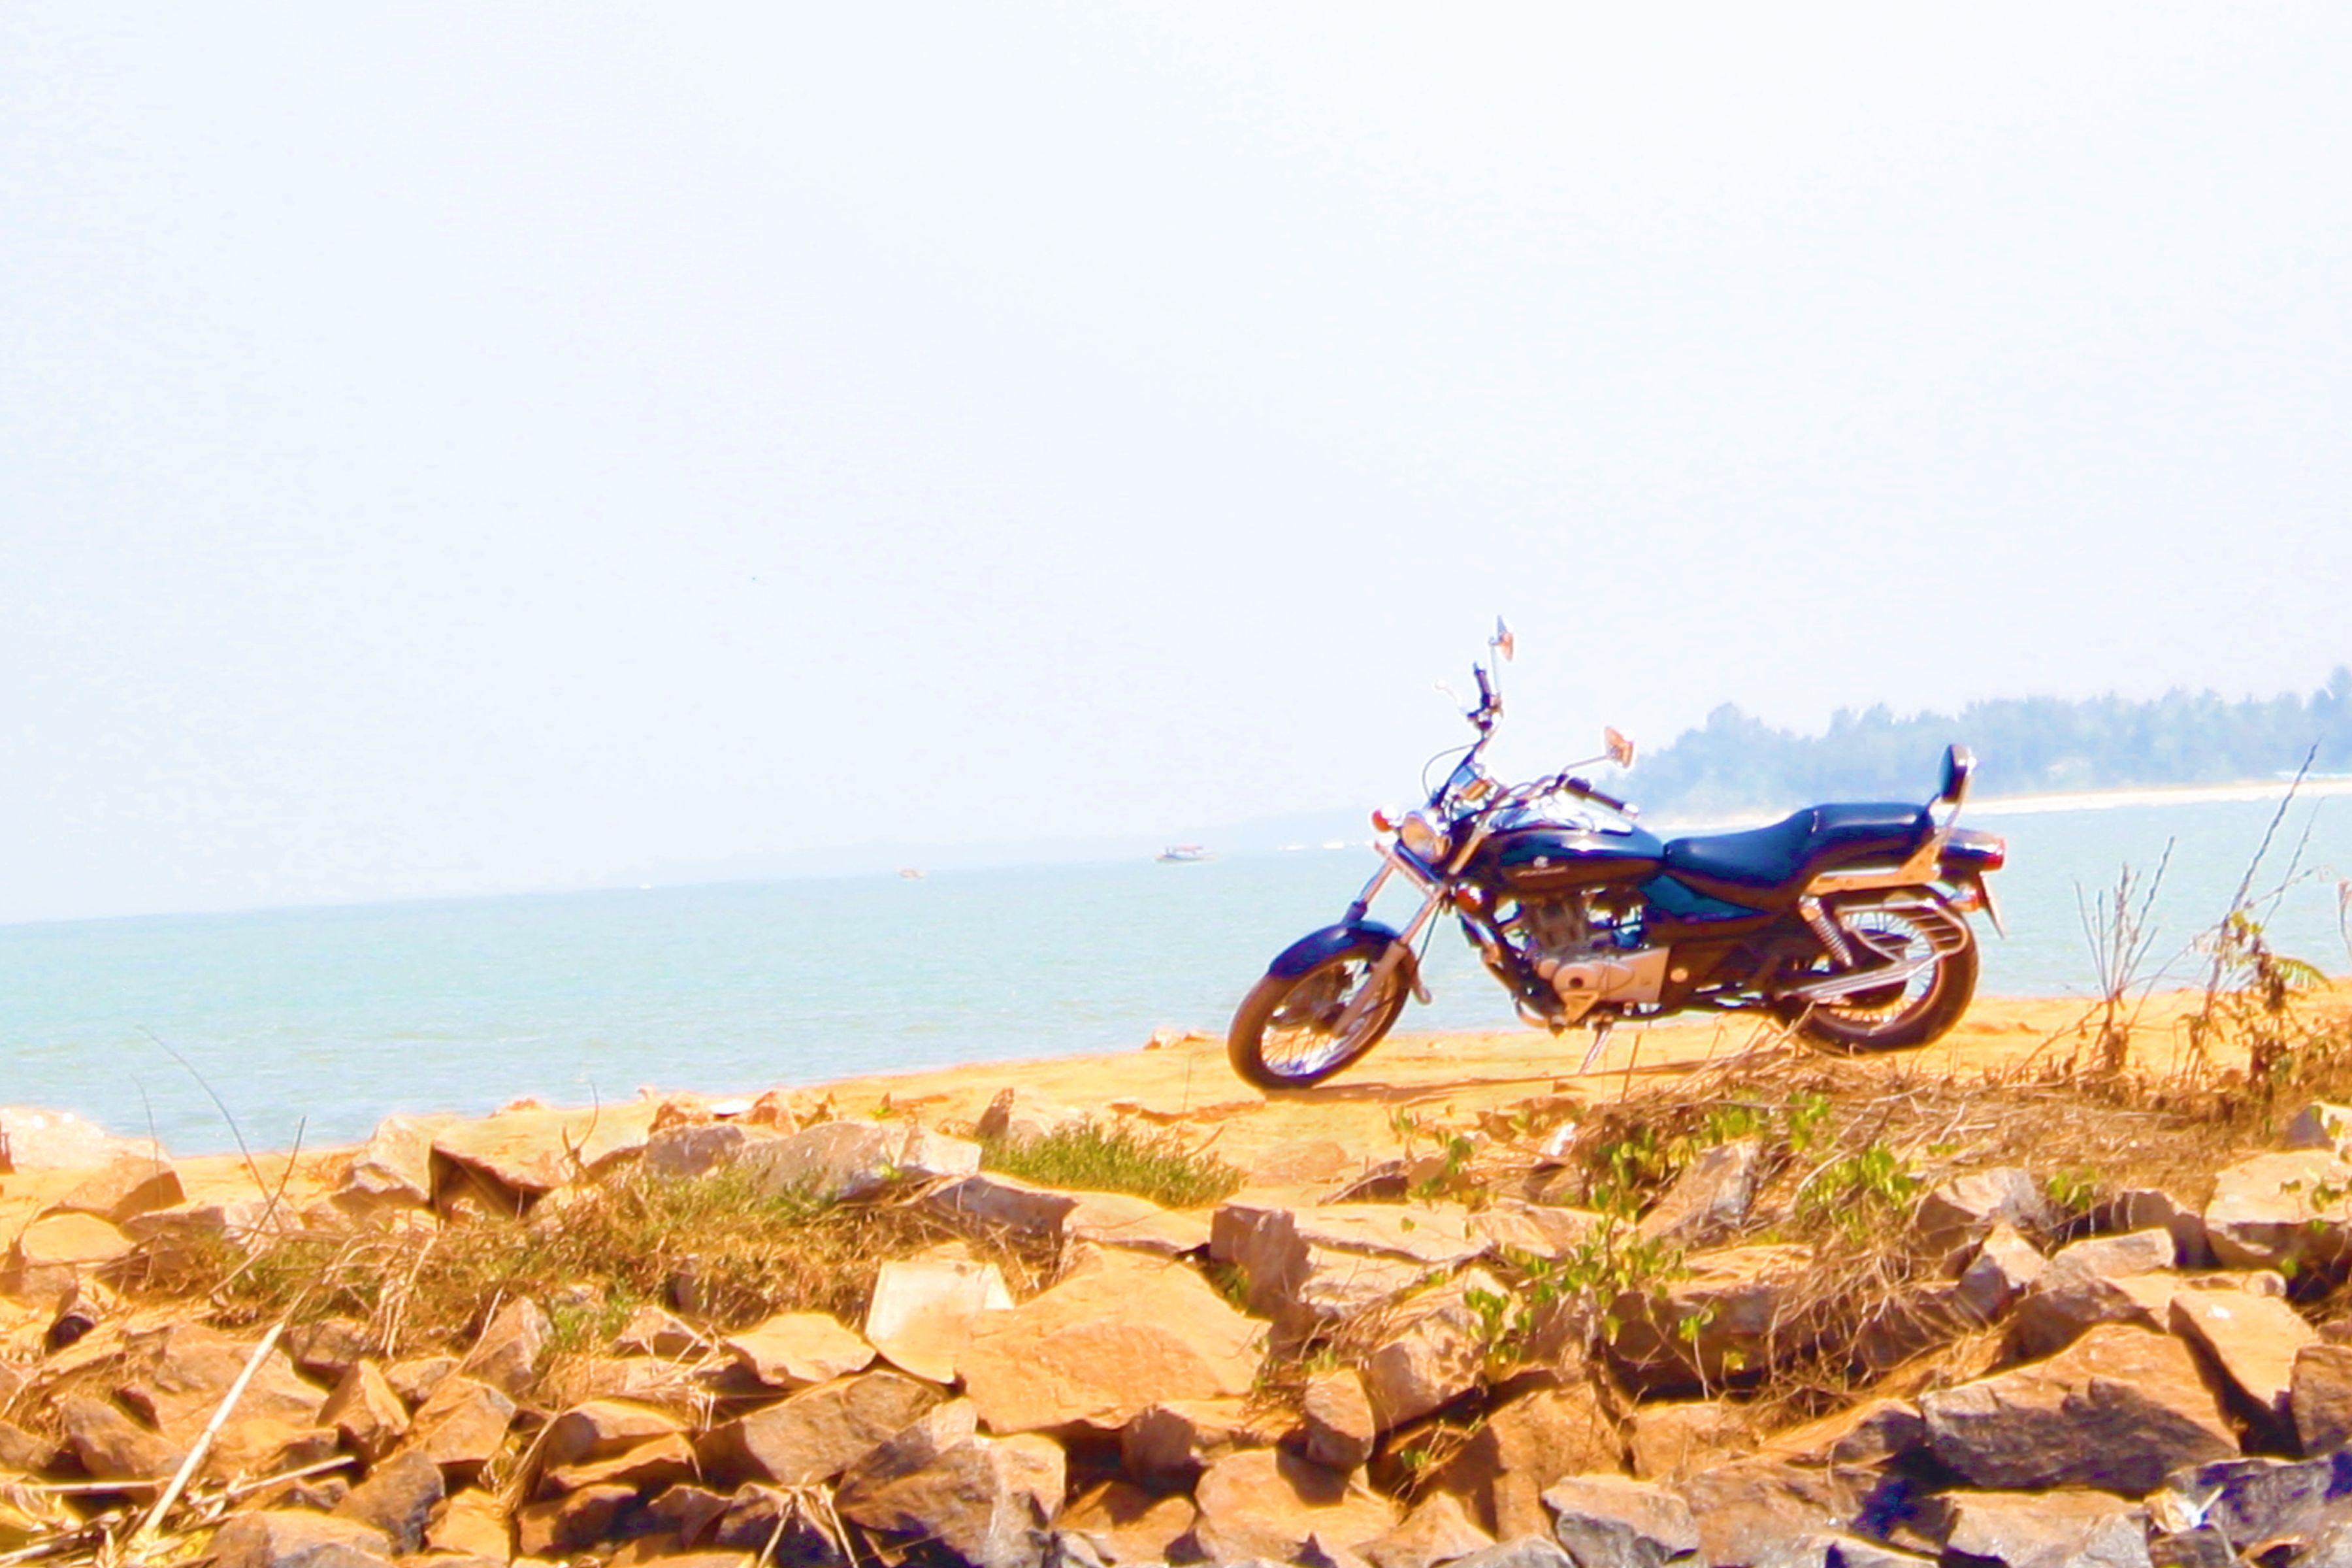 bike,trip,waiting,ourworld,malpe,St Mary's island,udupi,pravin,phenomenon,pm,throo da looking glass,bangalore blog